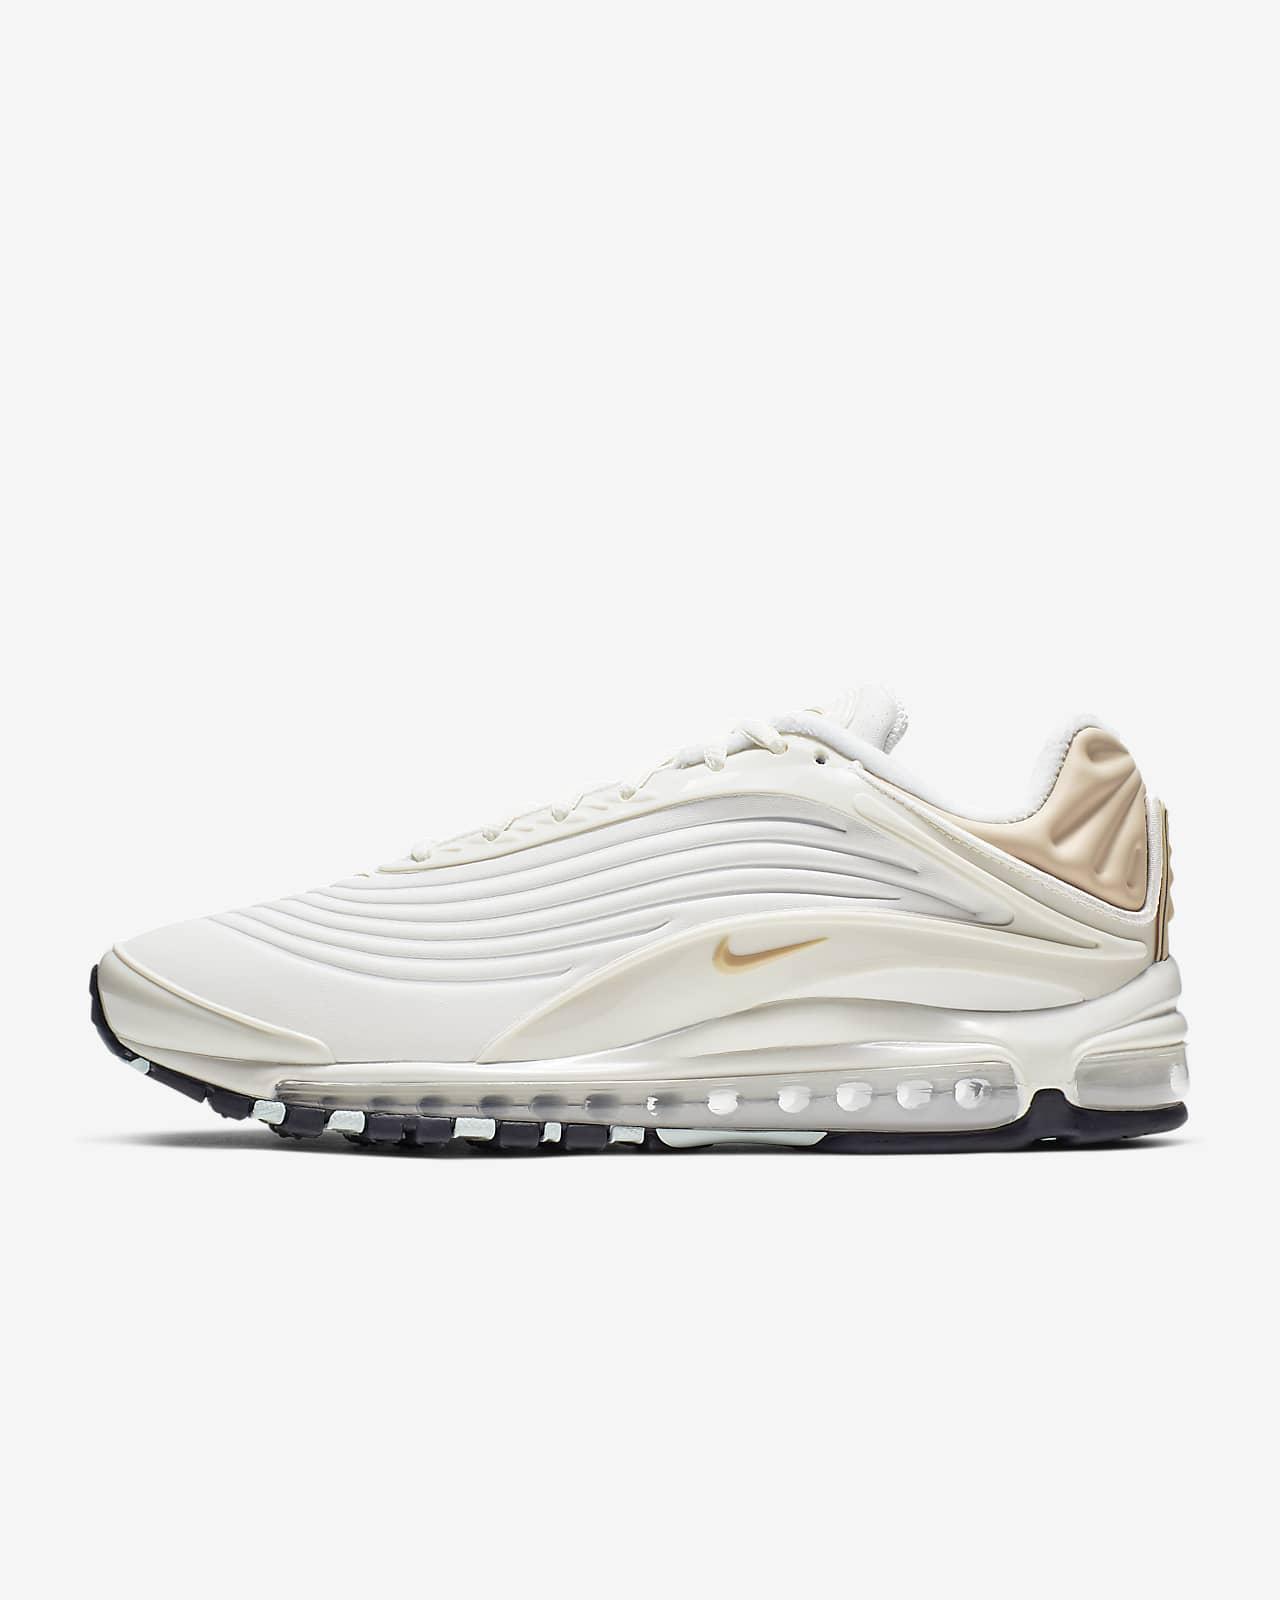 Nike Air Max Deluxe SE Men's Shoe